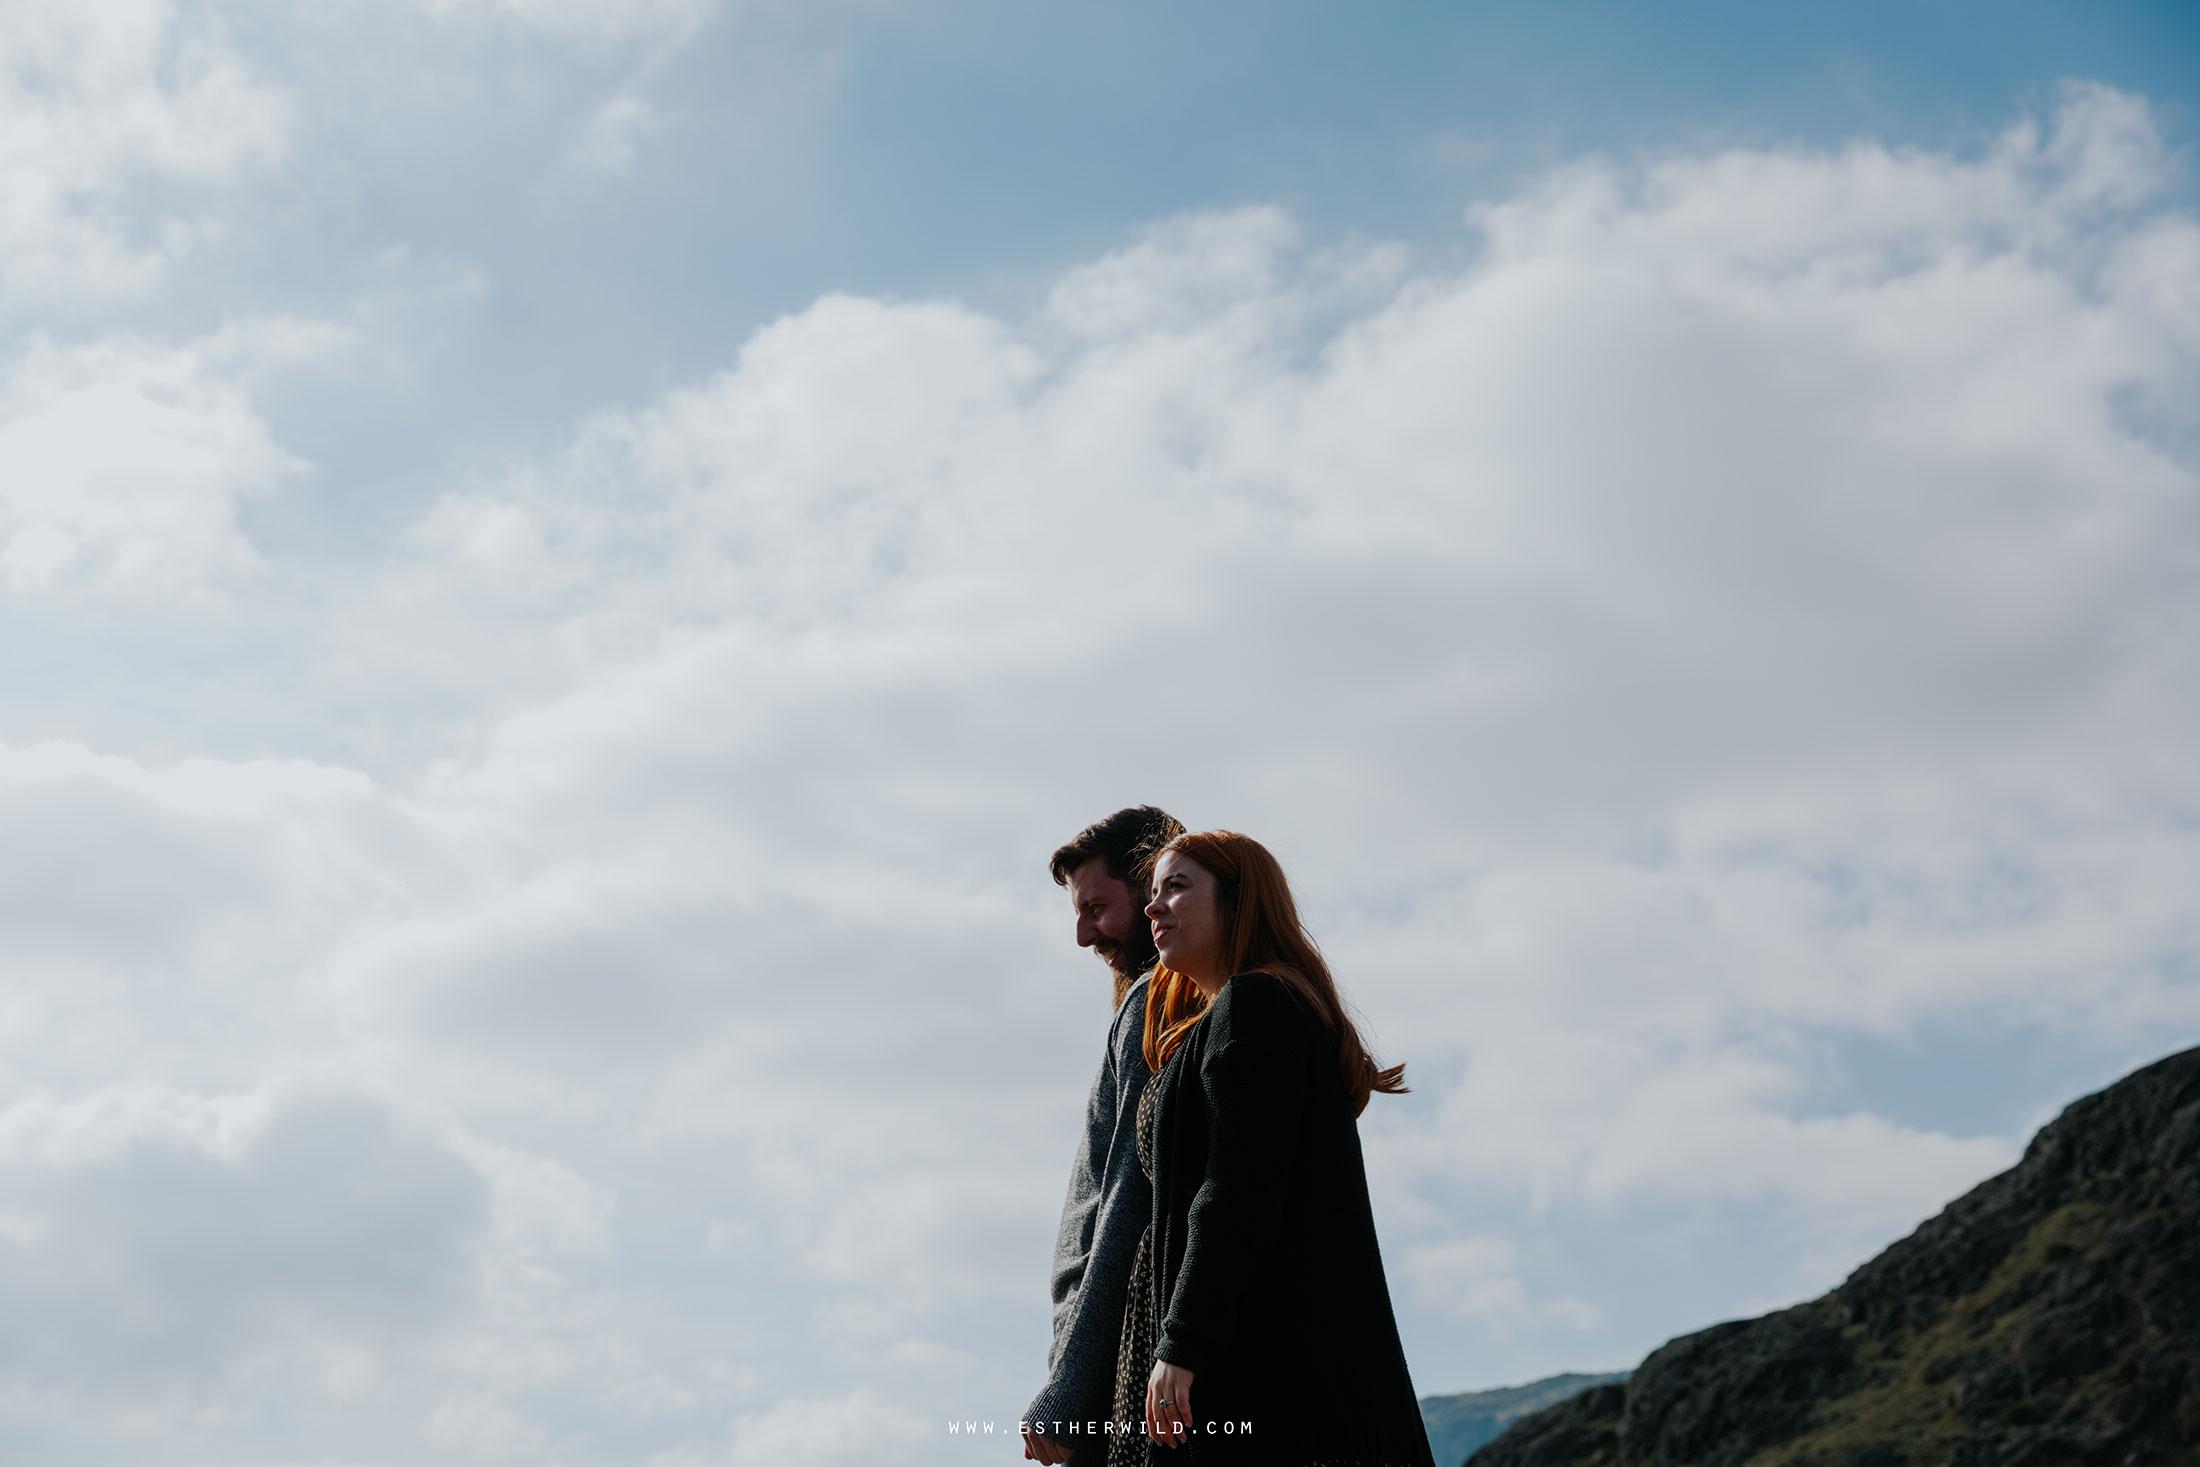 Cumbria_Lake_District_Wasdale_Wedding_Photographer_Destination_Engagement_Anniversary_Esther_Wild_IMG_3194.jpg